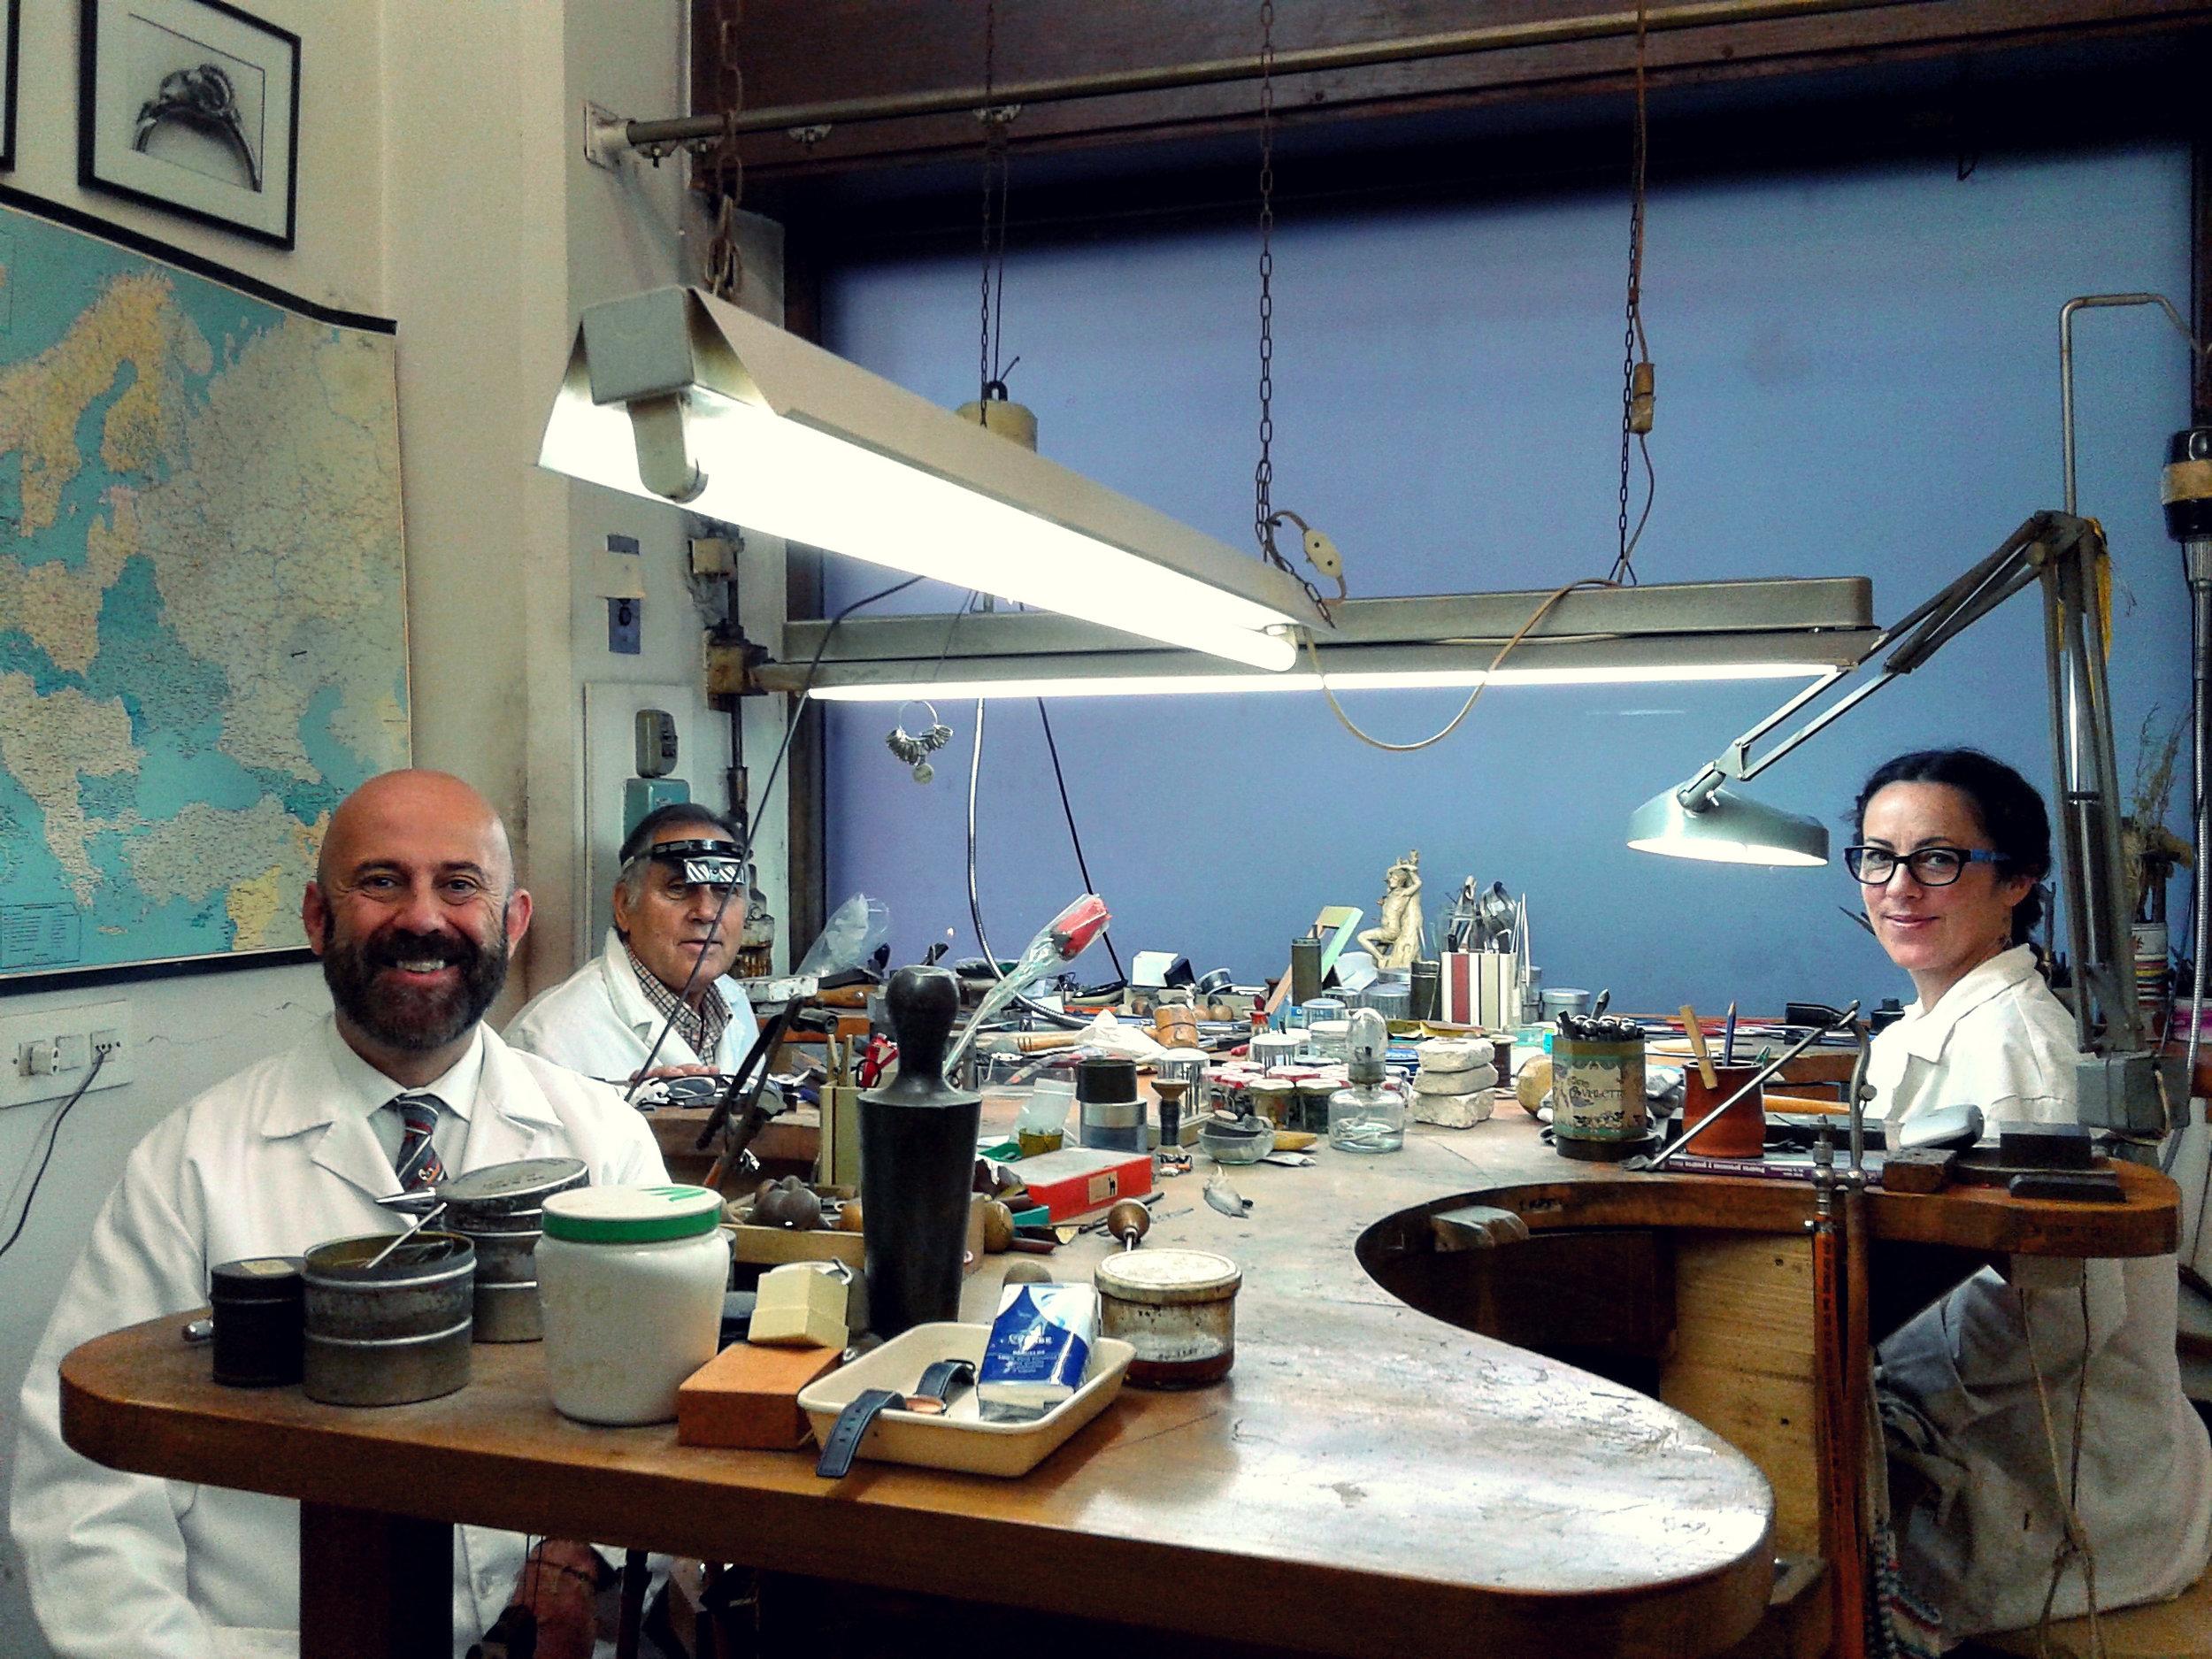 Claudio in his jewelry workshop